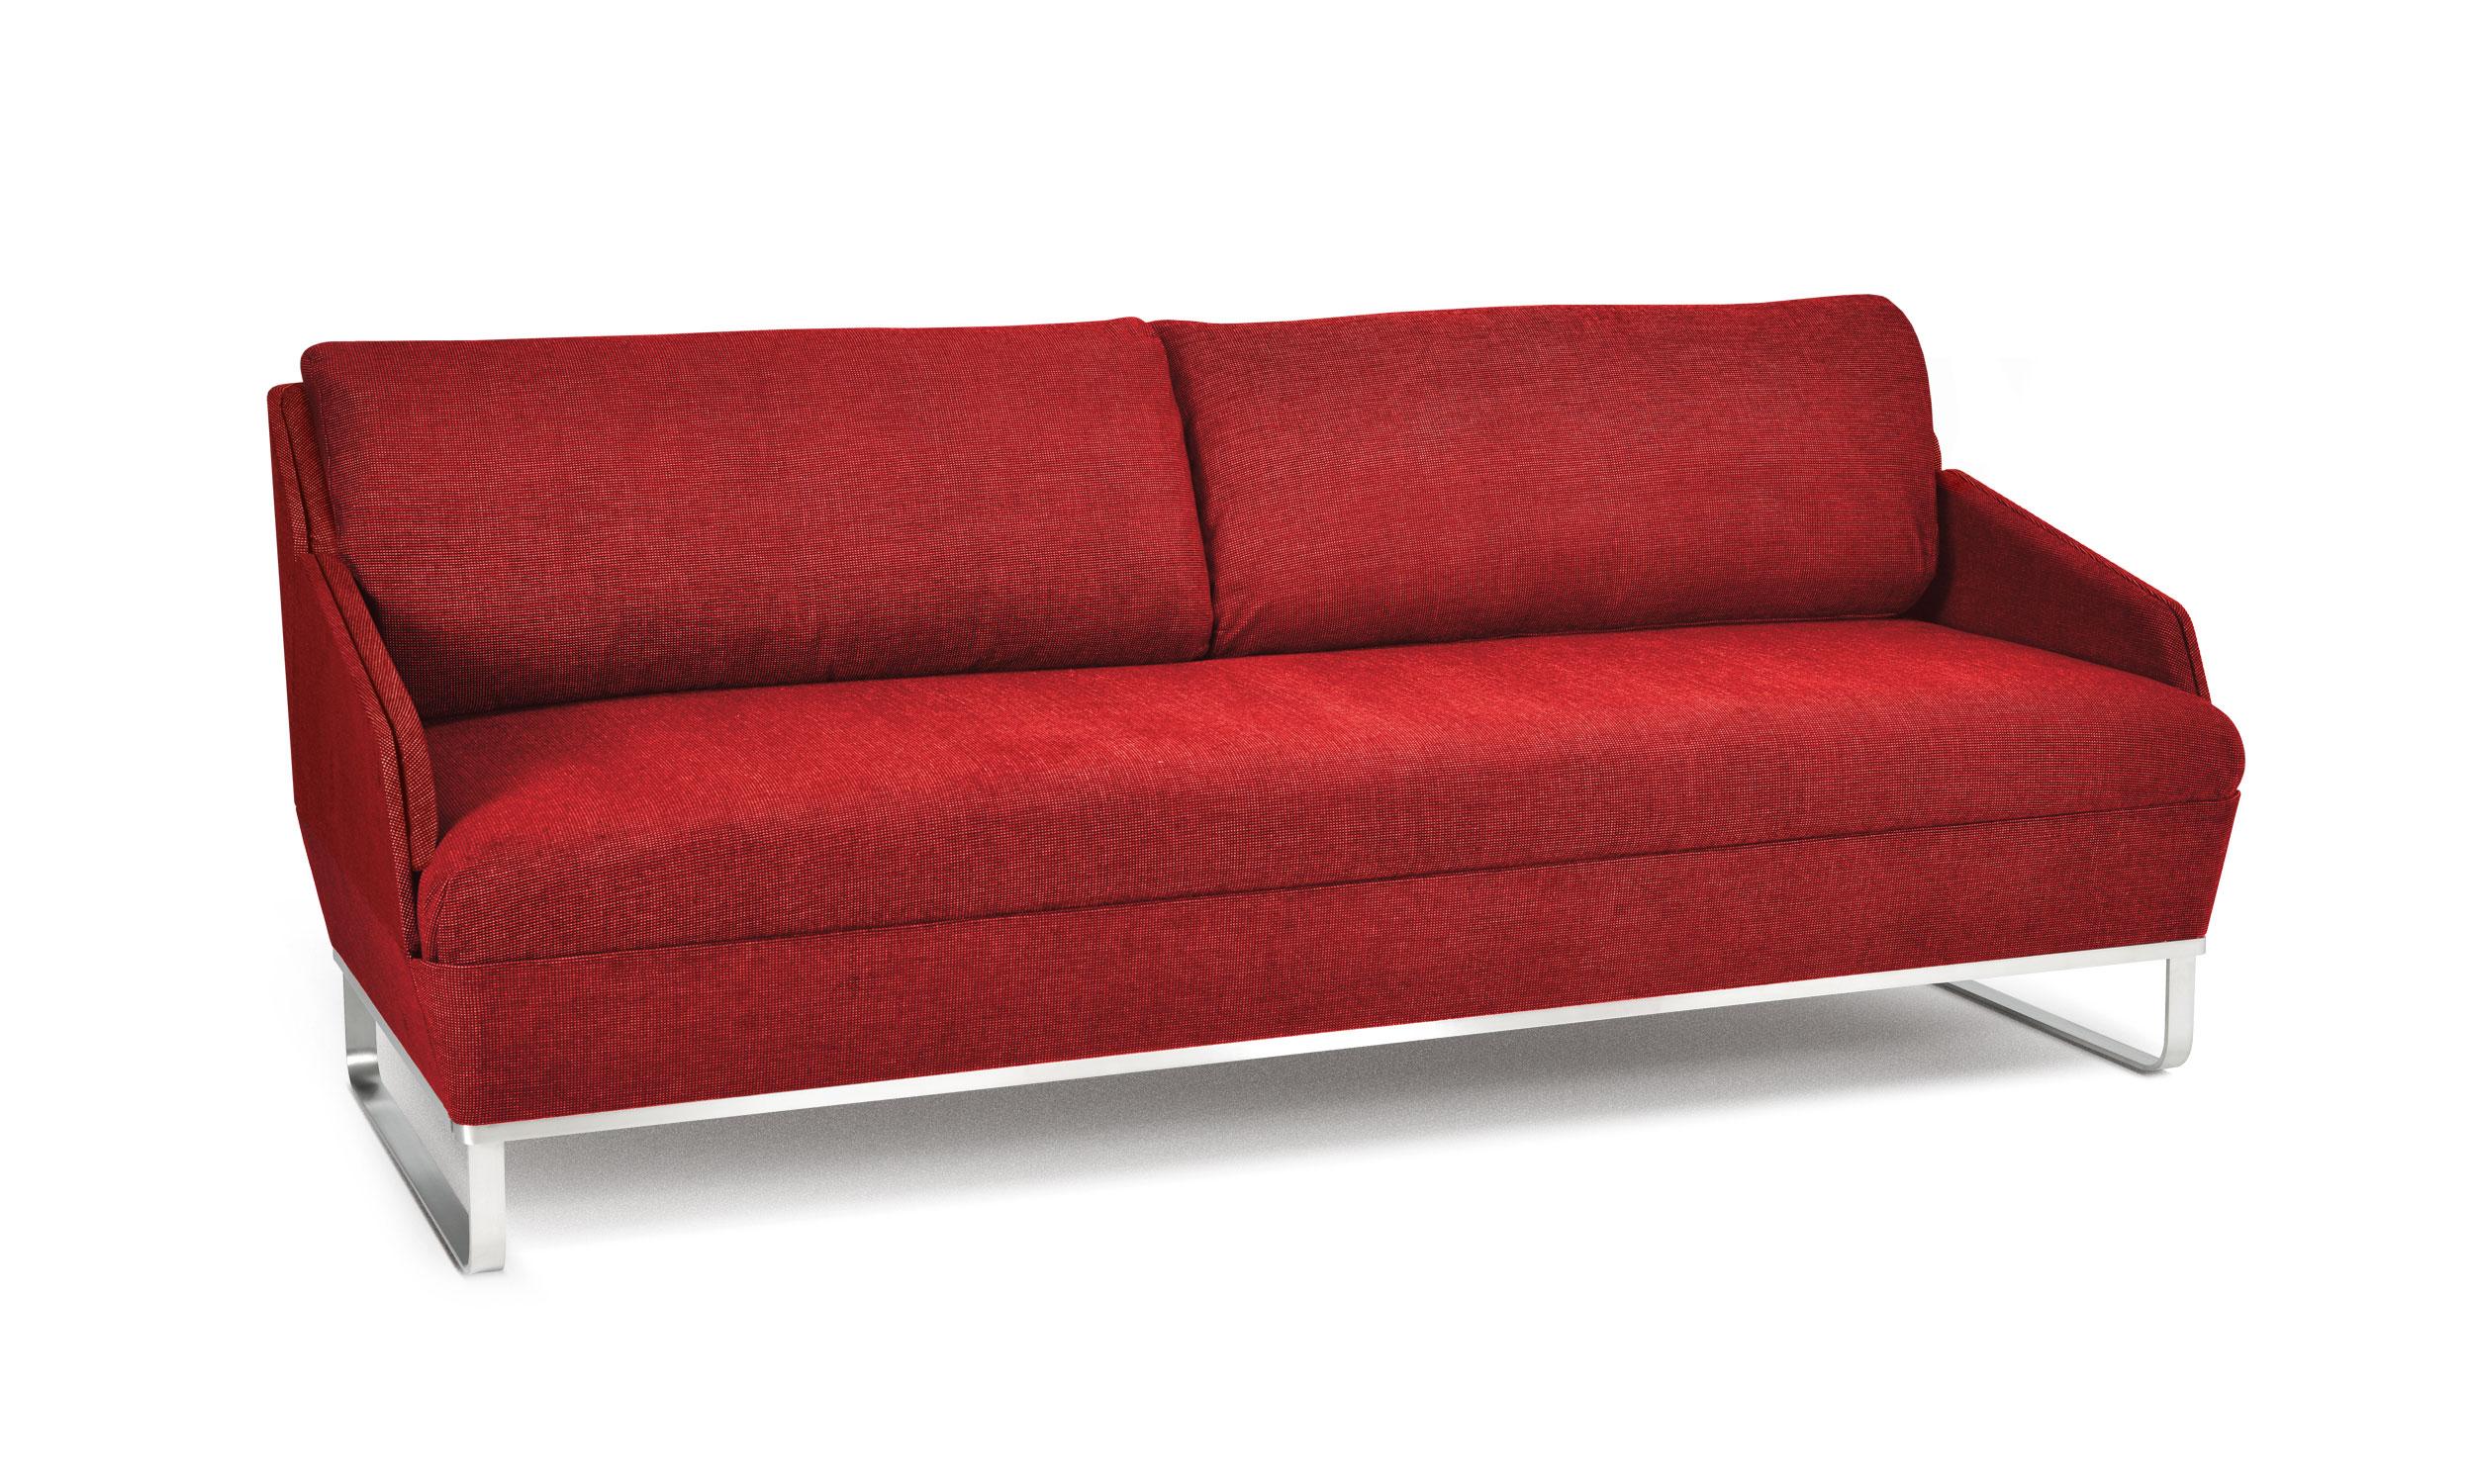 Bed for living deluxe swiss plus ag swissplus - Stoffe fur stuhle beziehen ...